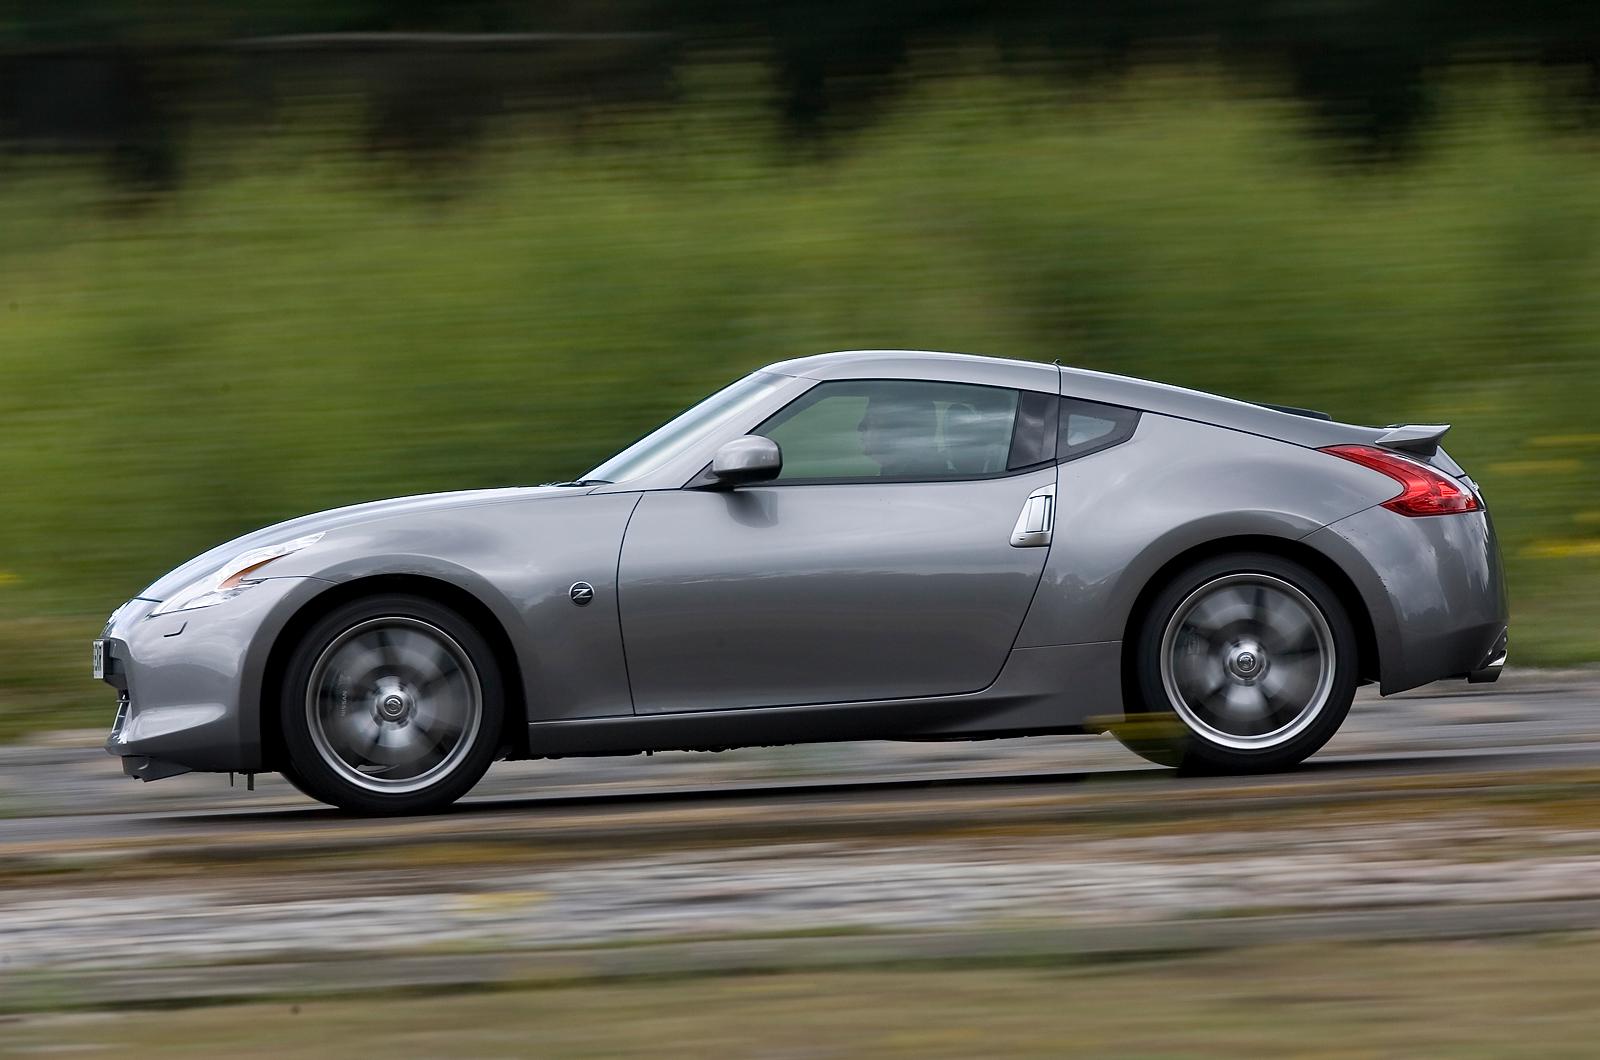 car review nissan 370z nismo driven road test bbc top. Black Bedroom Furniture Sets. Home Design Ideas